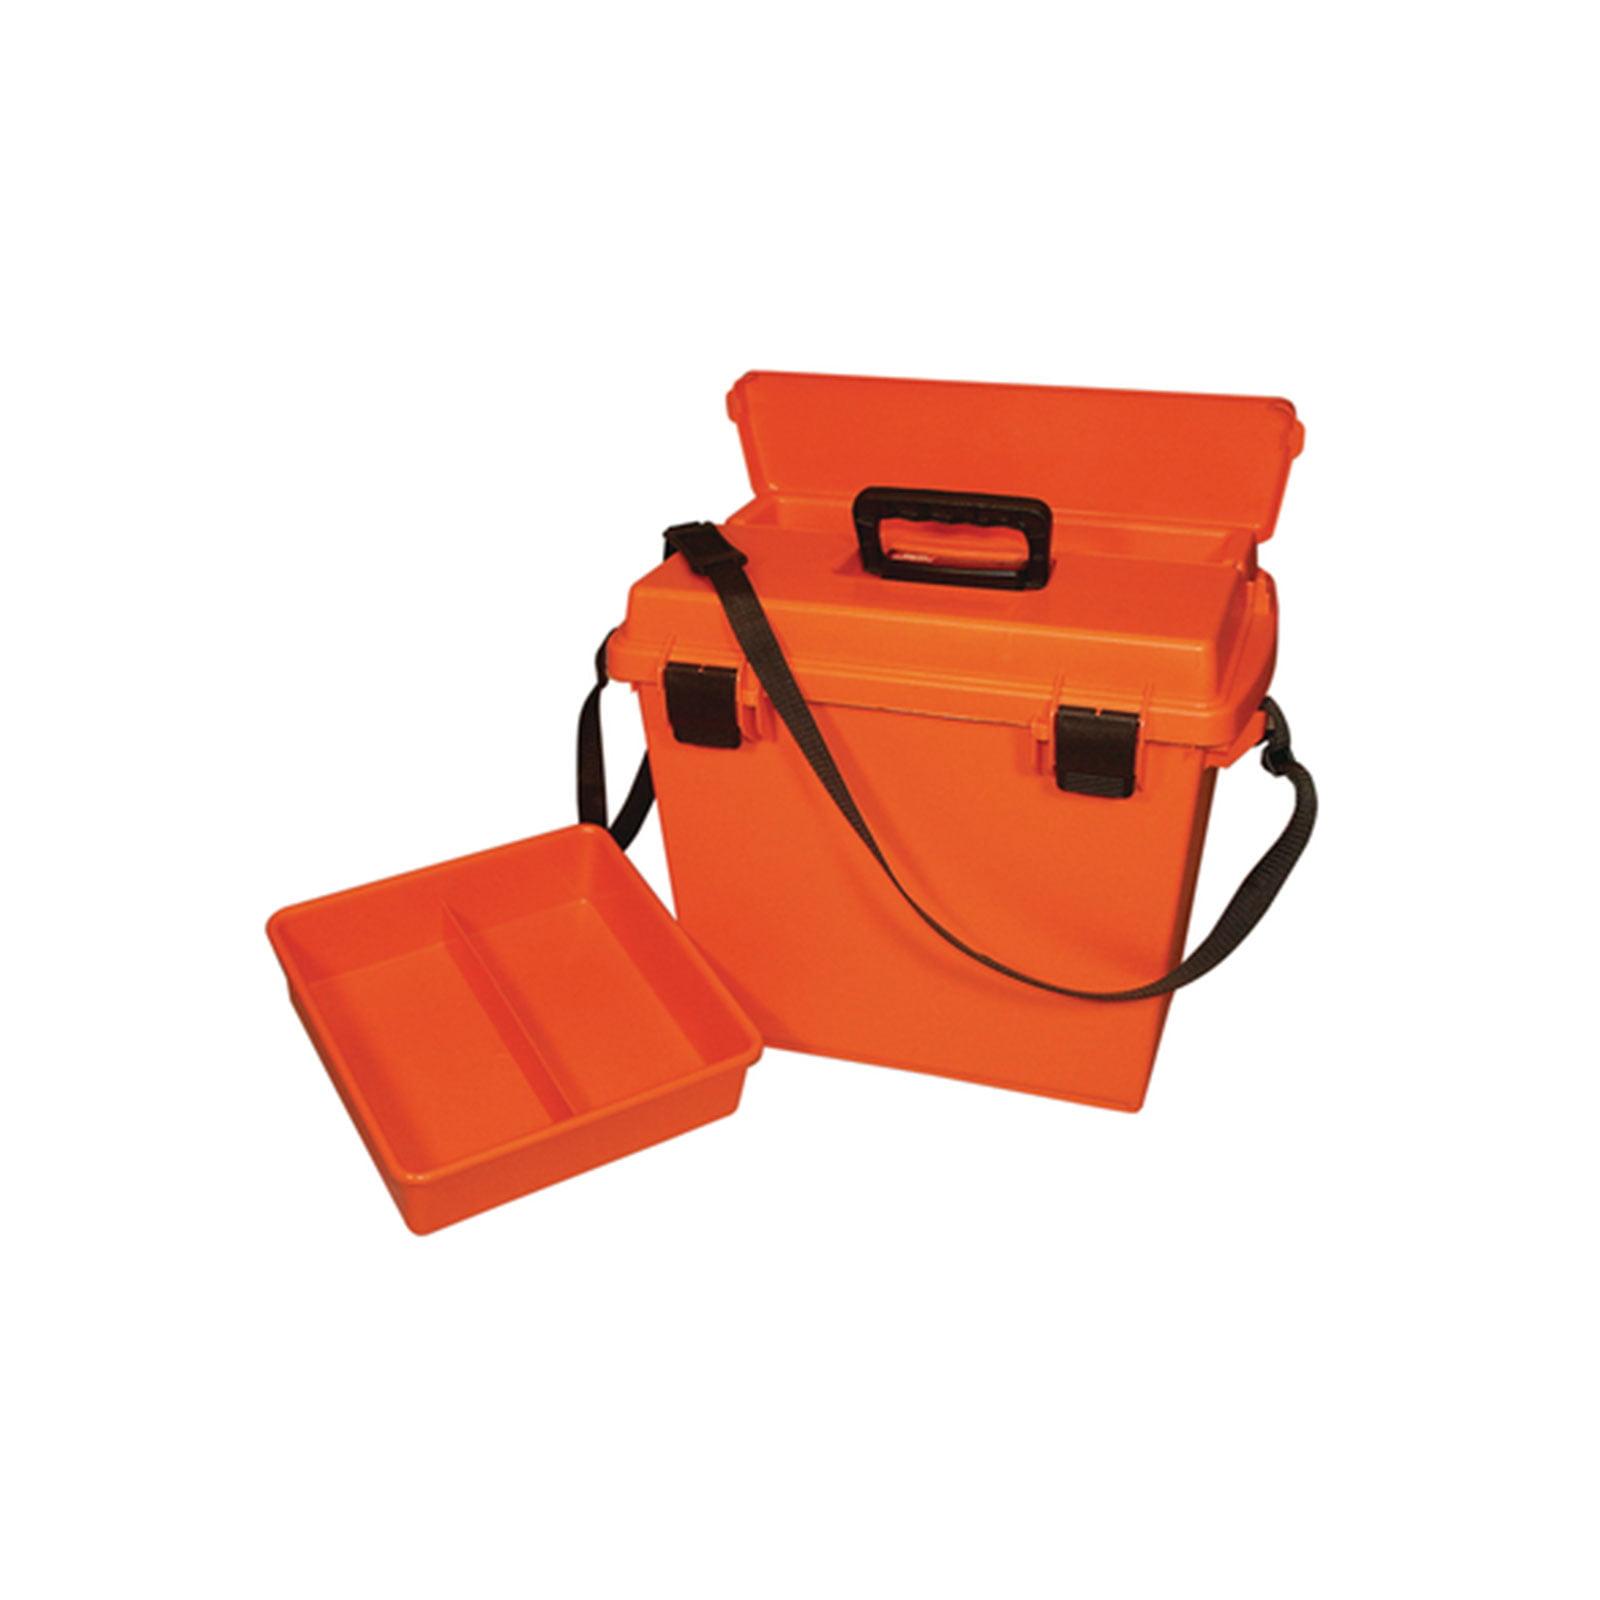 "MTM Sportsman Plus Utility Dry Box 18"" x 13"" x 15"" Orange, SPUD7-35"